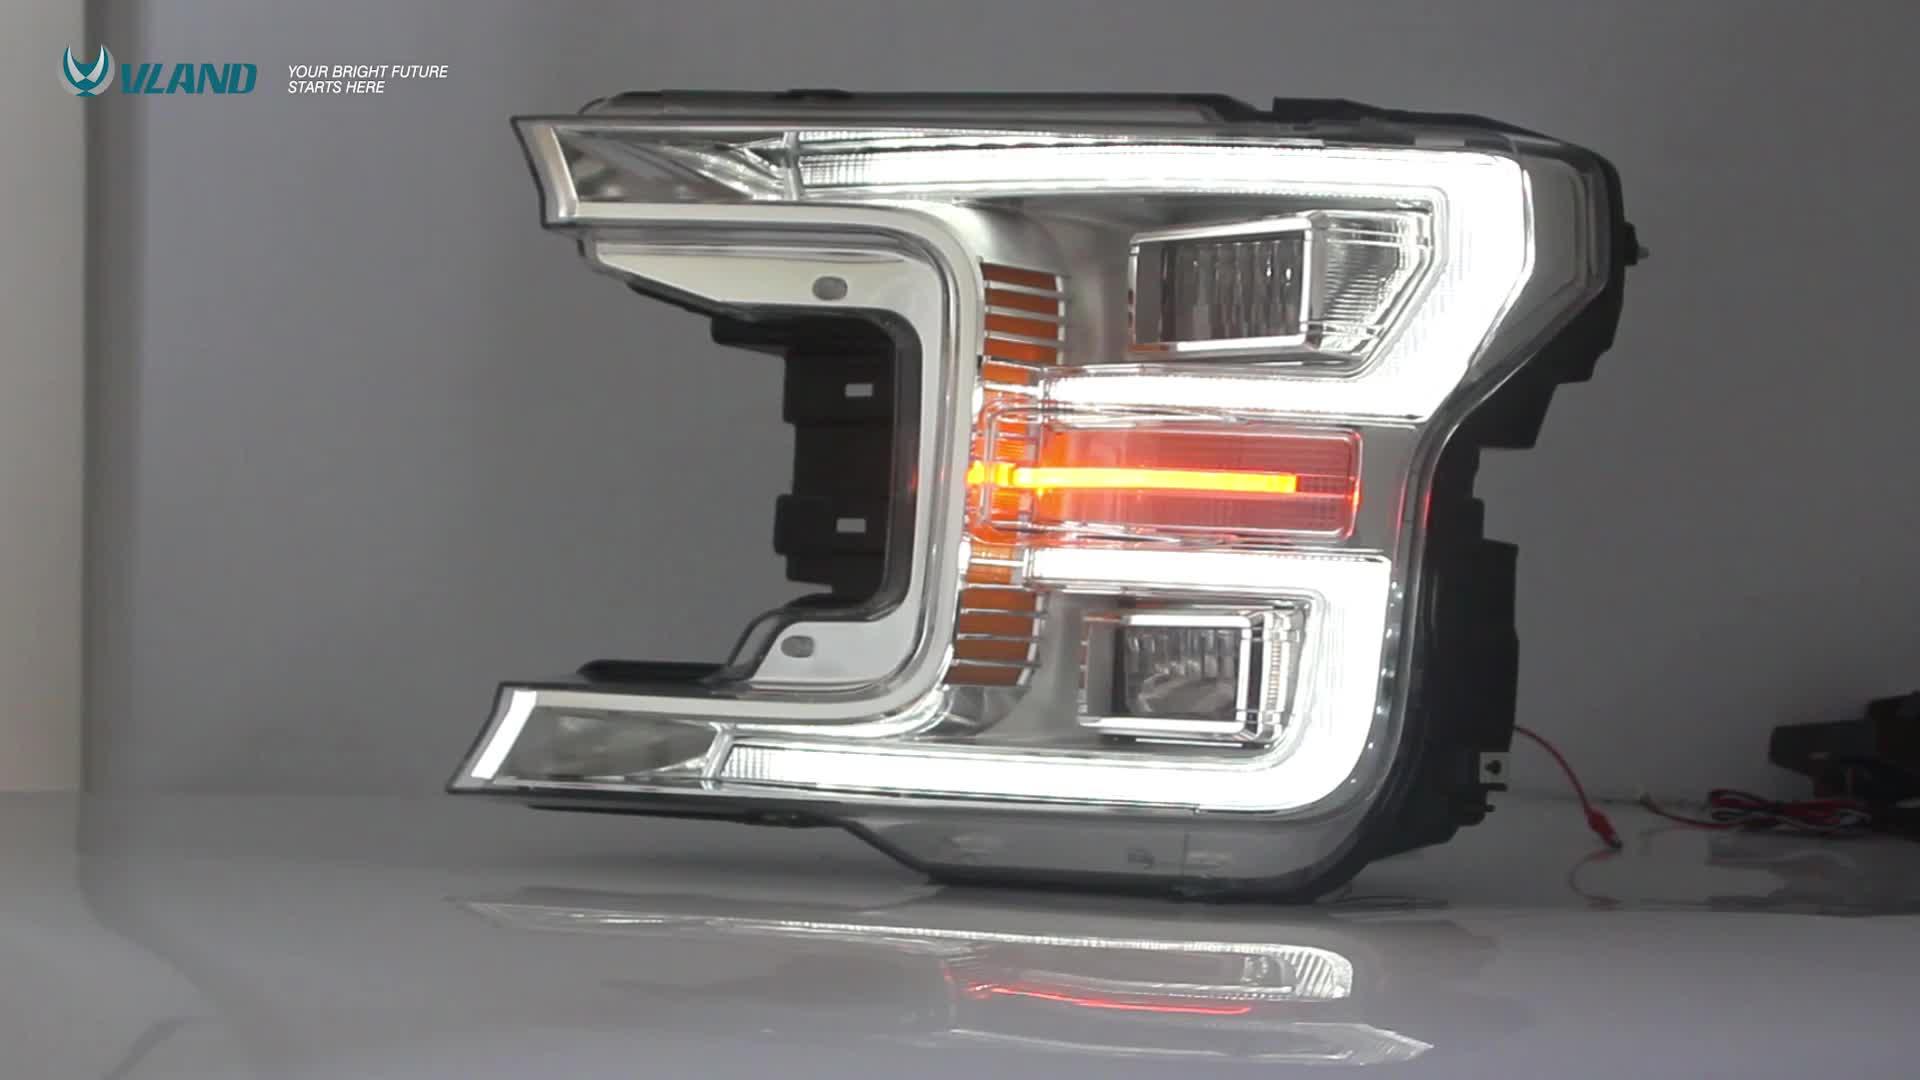 VLAND Atacado Dinâmica Turn Signal LED Full Lobo Cabeça luzes 2018 2019 led farol Para Ford F150